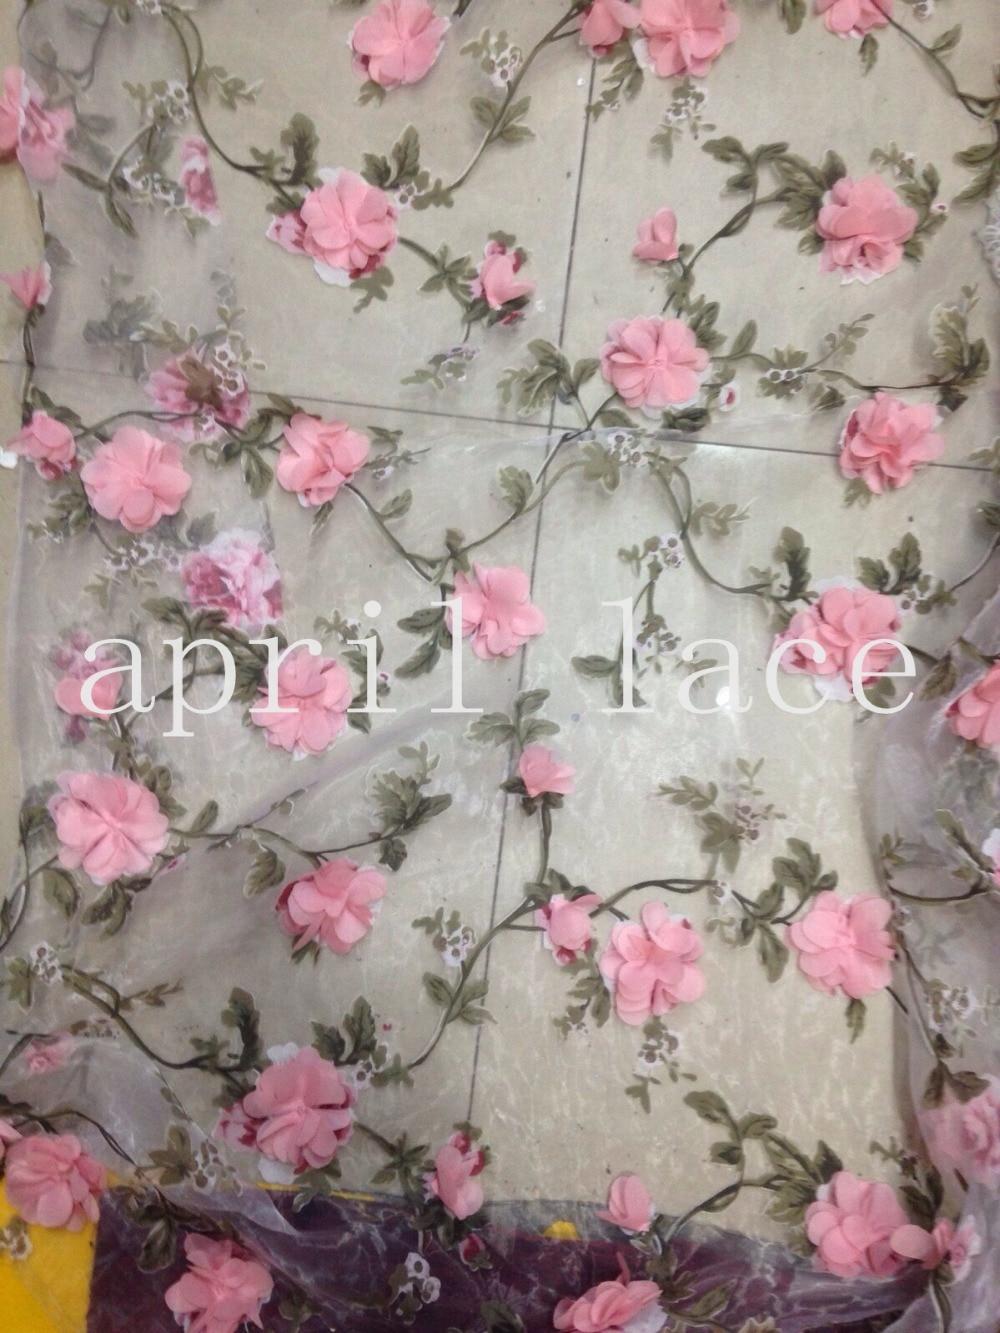 Aliexpress buy yards jy pink chiffon d rose